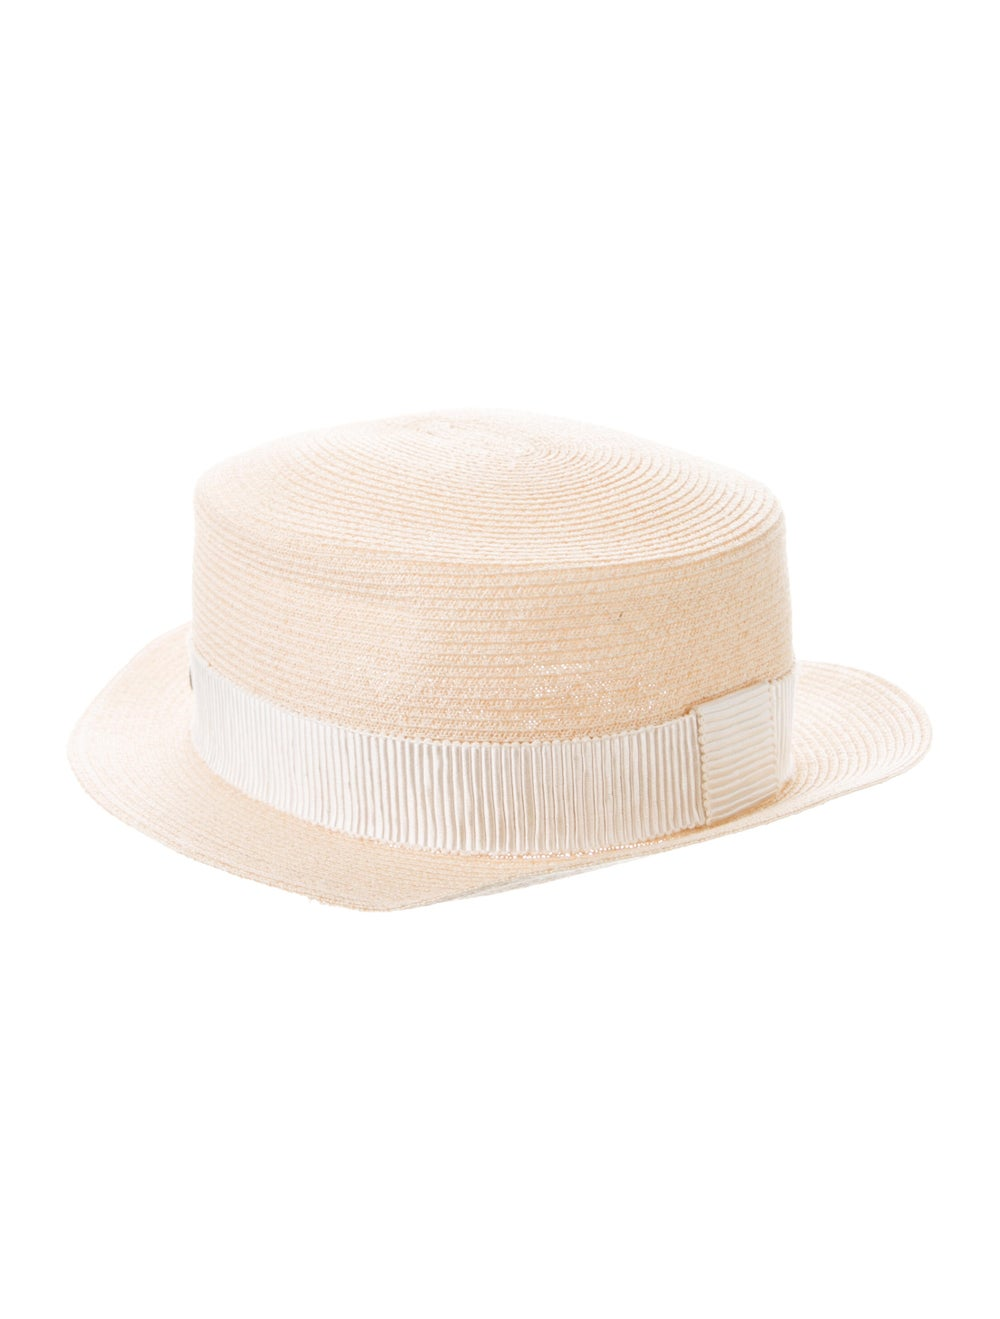 Maison Michel Straw Wide Brim Hat Tan - image 2